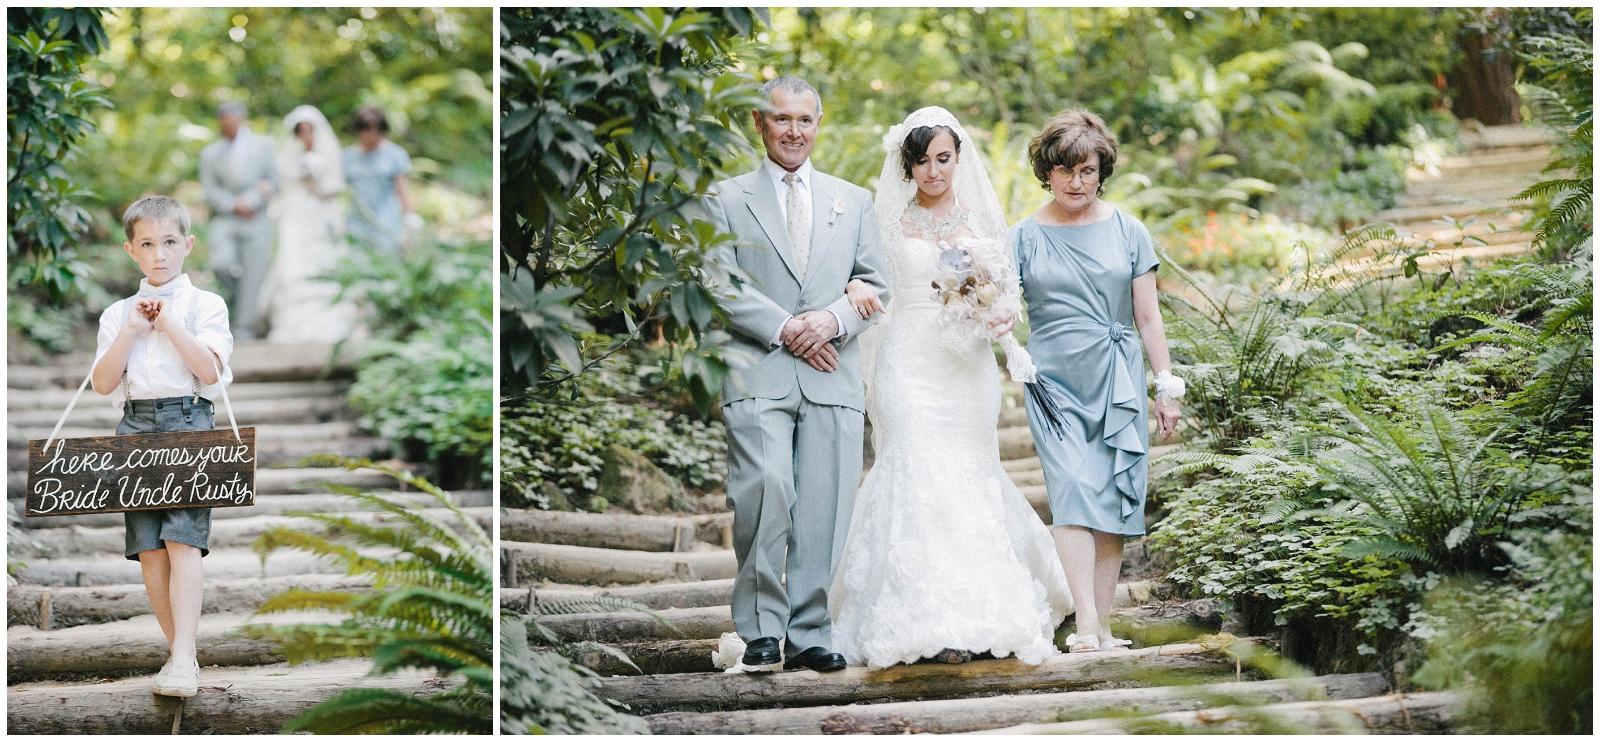 San-Francisco-Bay-Area-Wedding-Photography_Nestle_Down_15.jpg